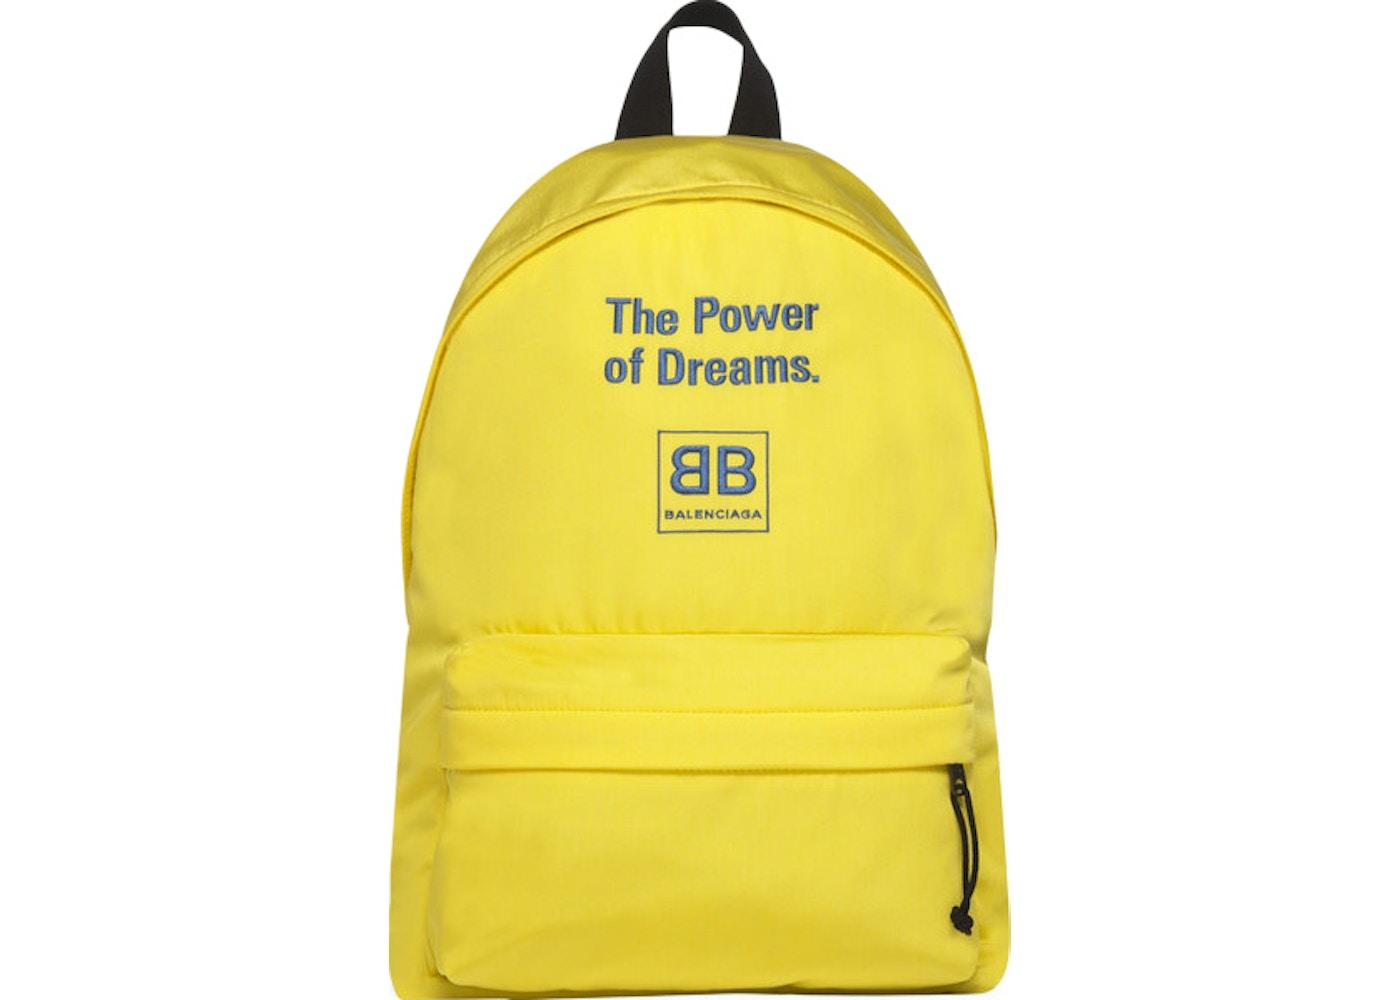 Balenciaga Explorer Backpack The Power of Dreams Large Yellow Blue 45bdeb1a6a4b6